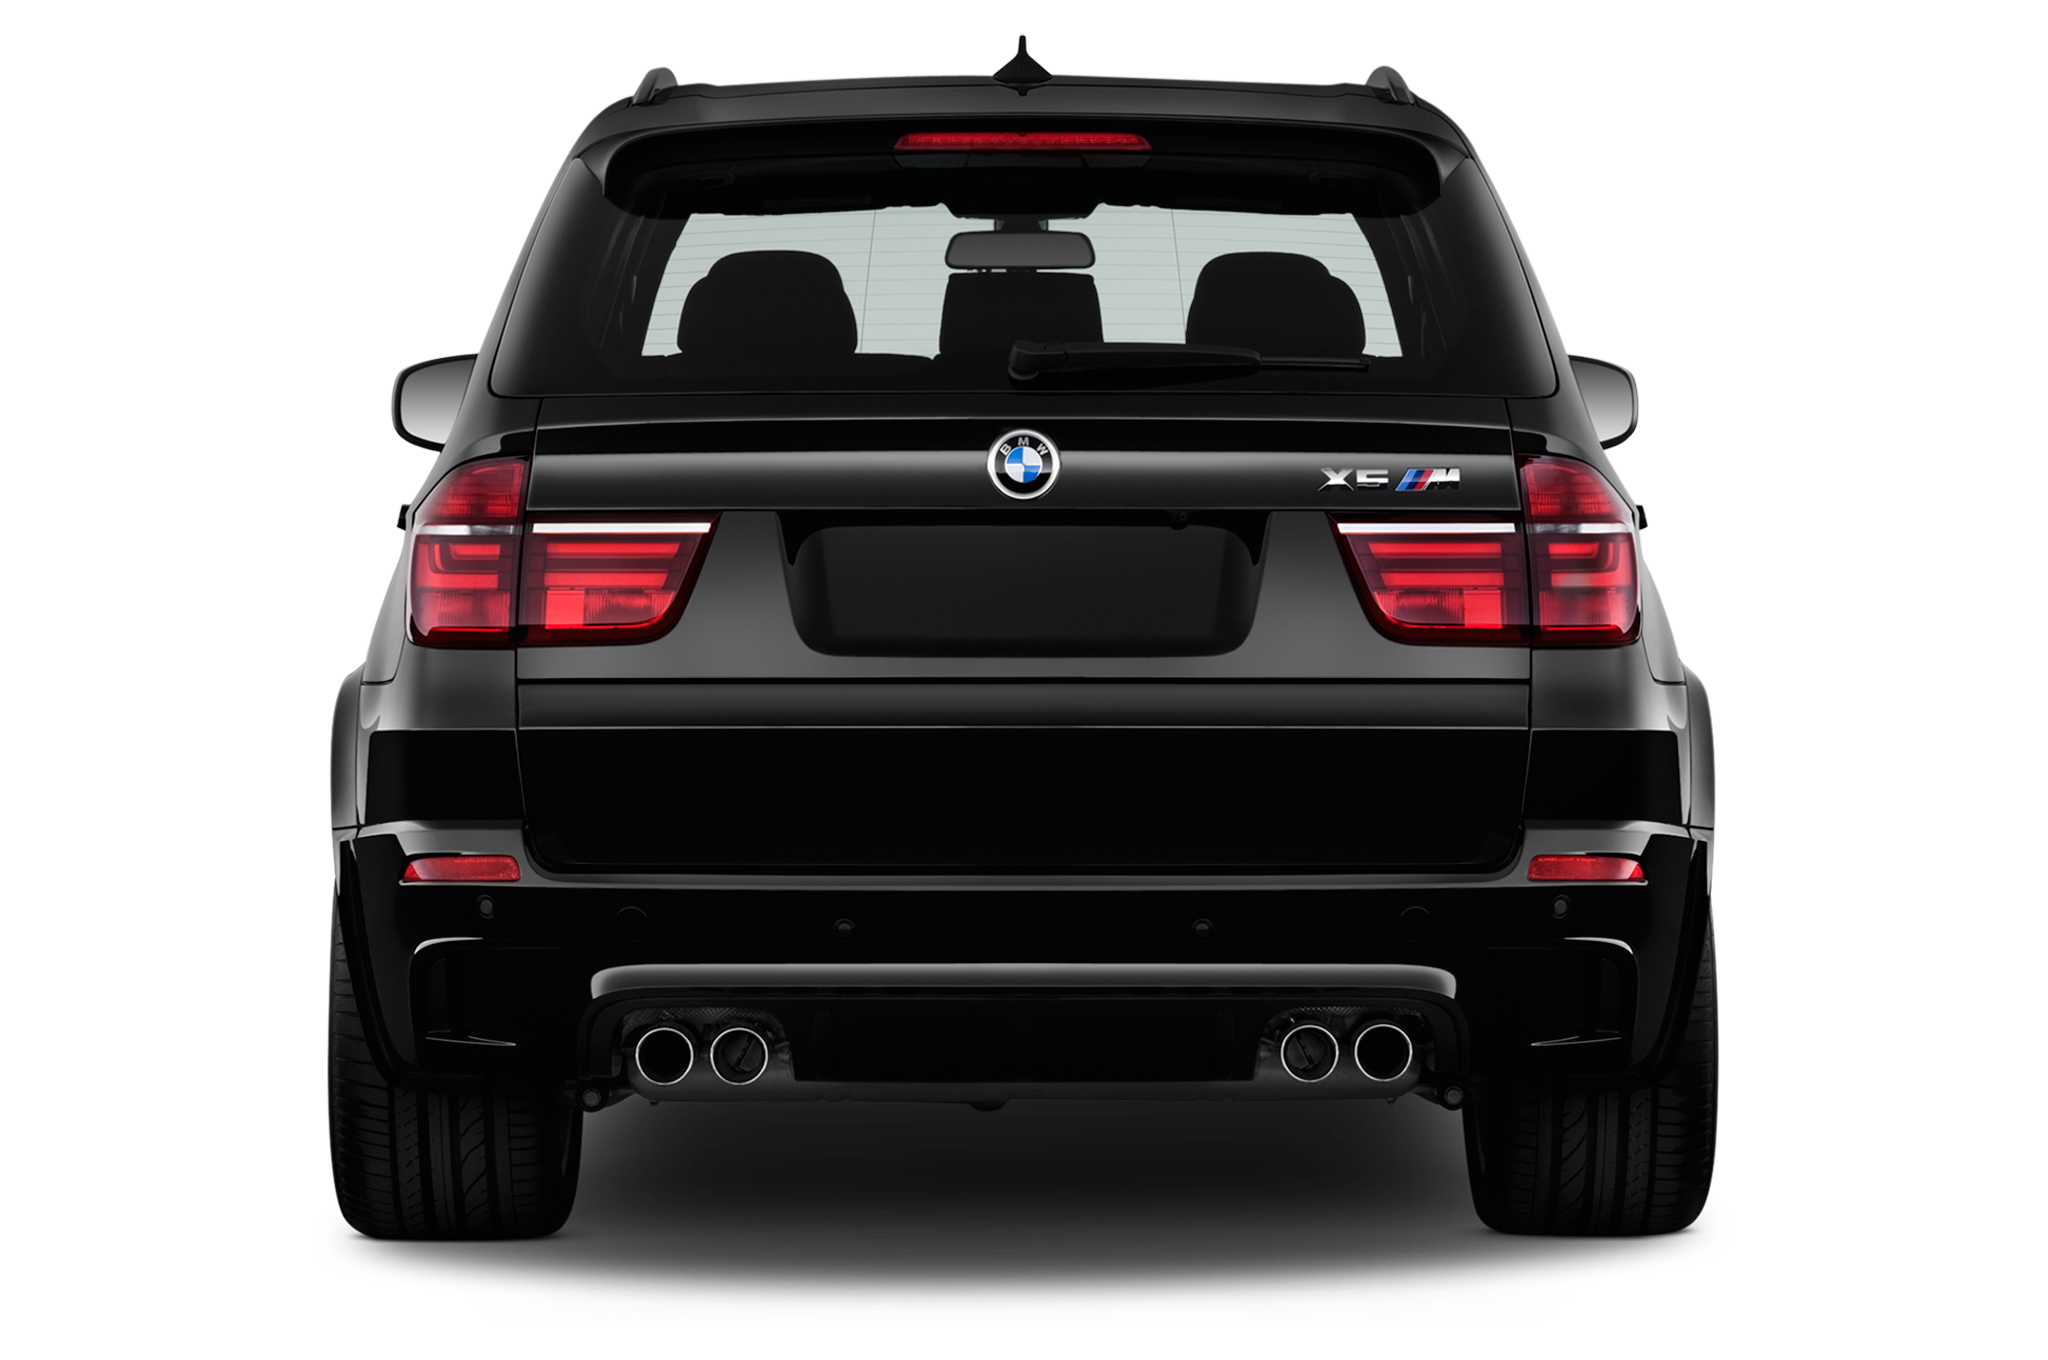 2012 BMW X5 M - Editors\' Notebook - Automobile Magazine